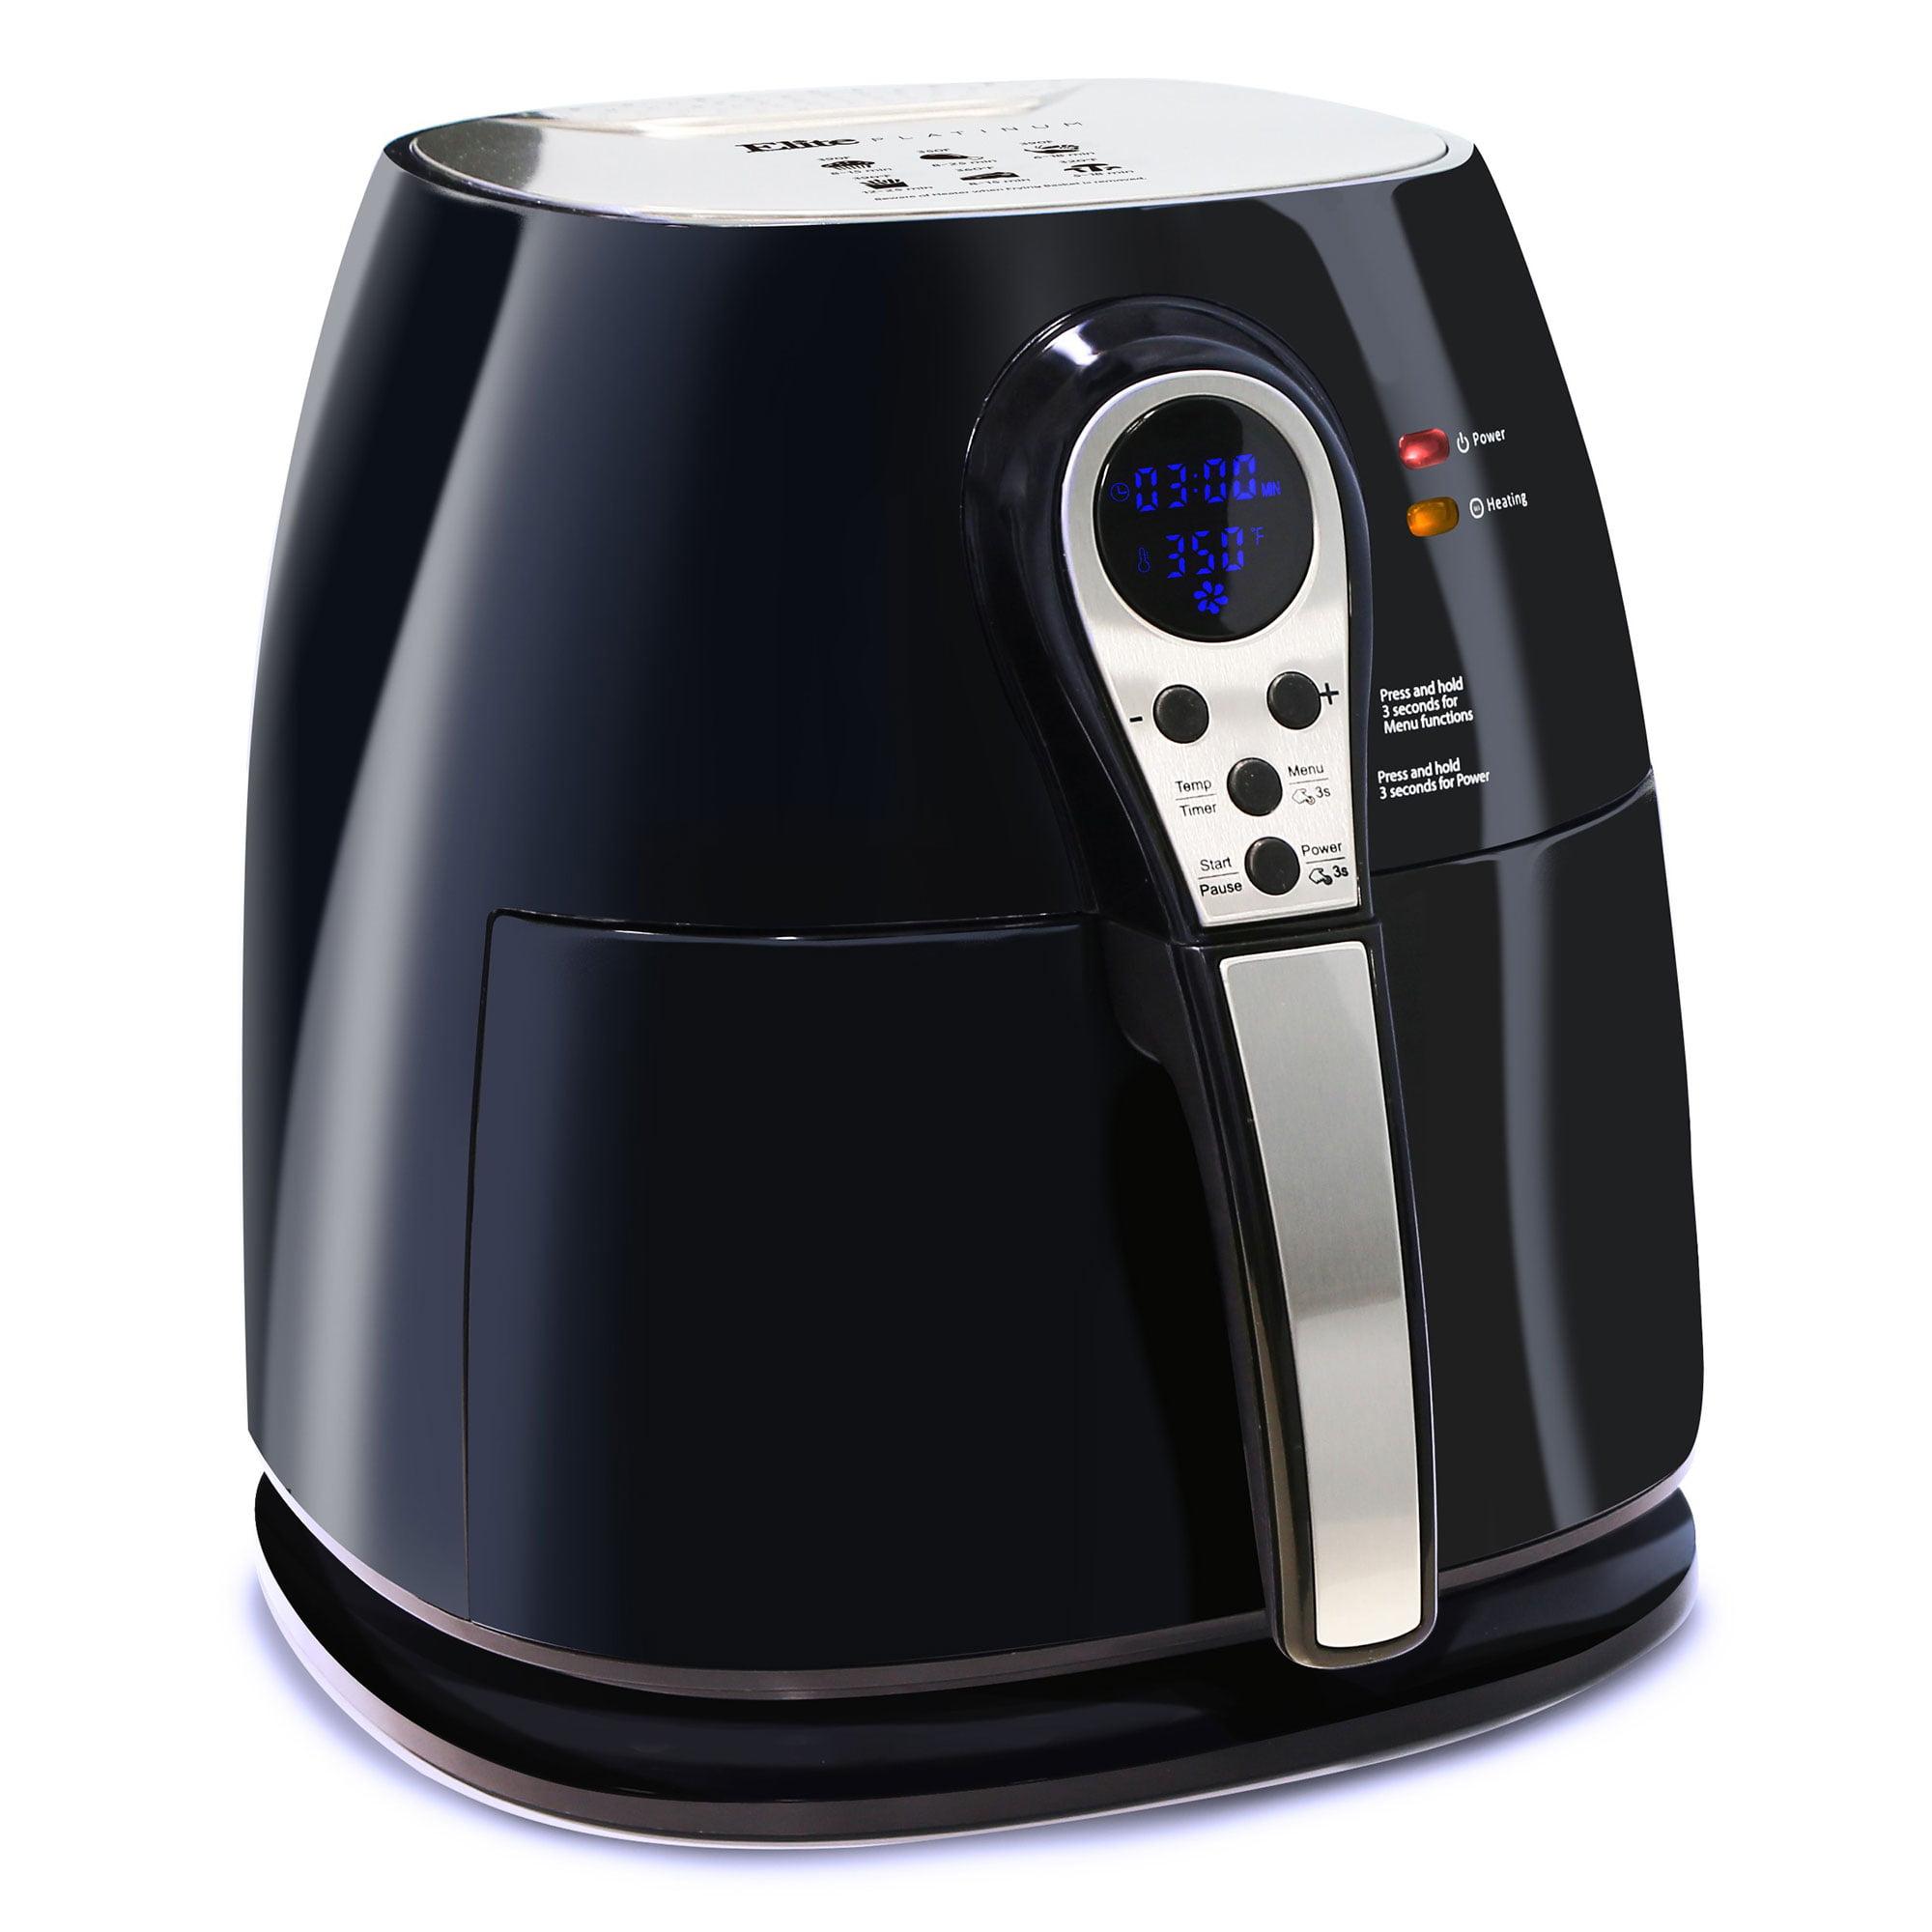 Maxi Matic 3.2 Qt. Capacity Oil Free 1400W Healthy Home Kitchen Air Fryer, Black